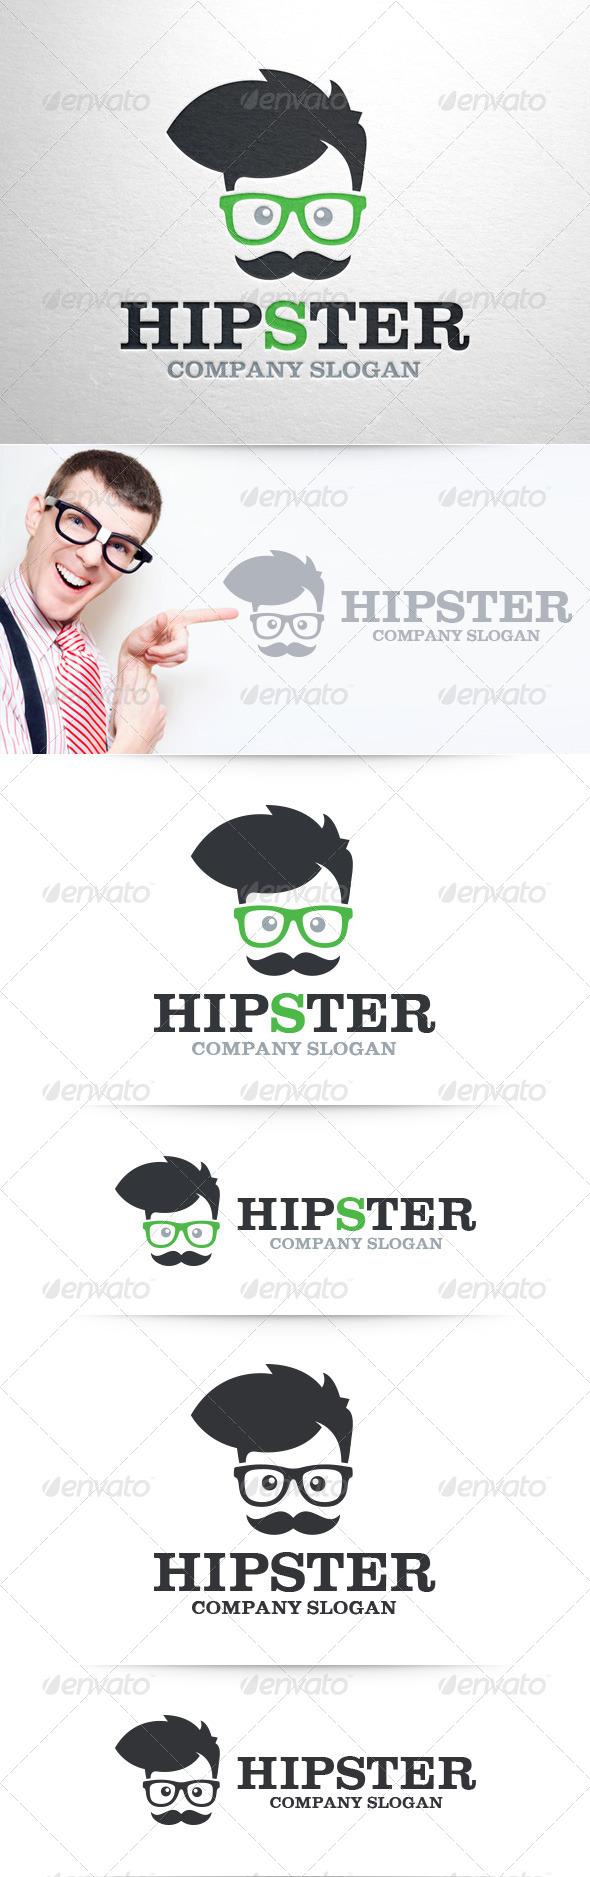 GraphicRiver Hipster Logo Template v2 8461767